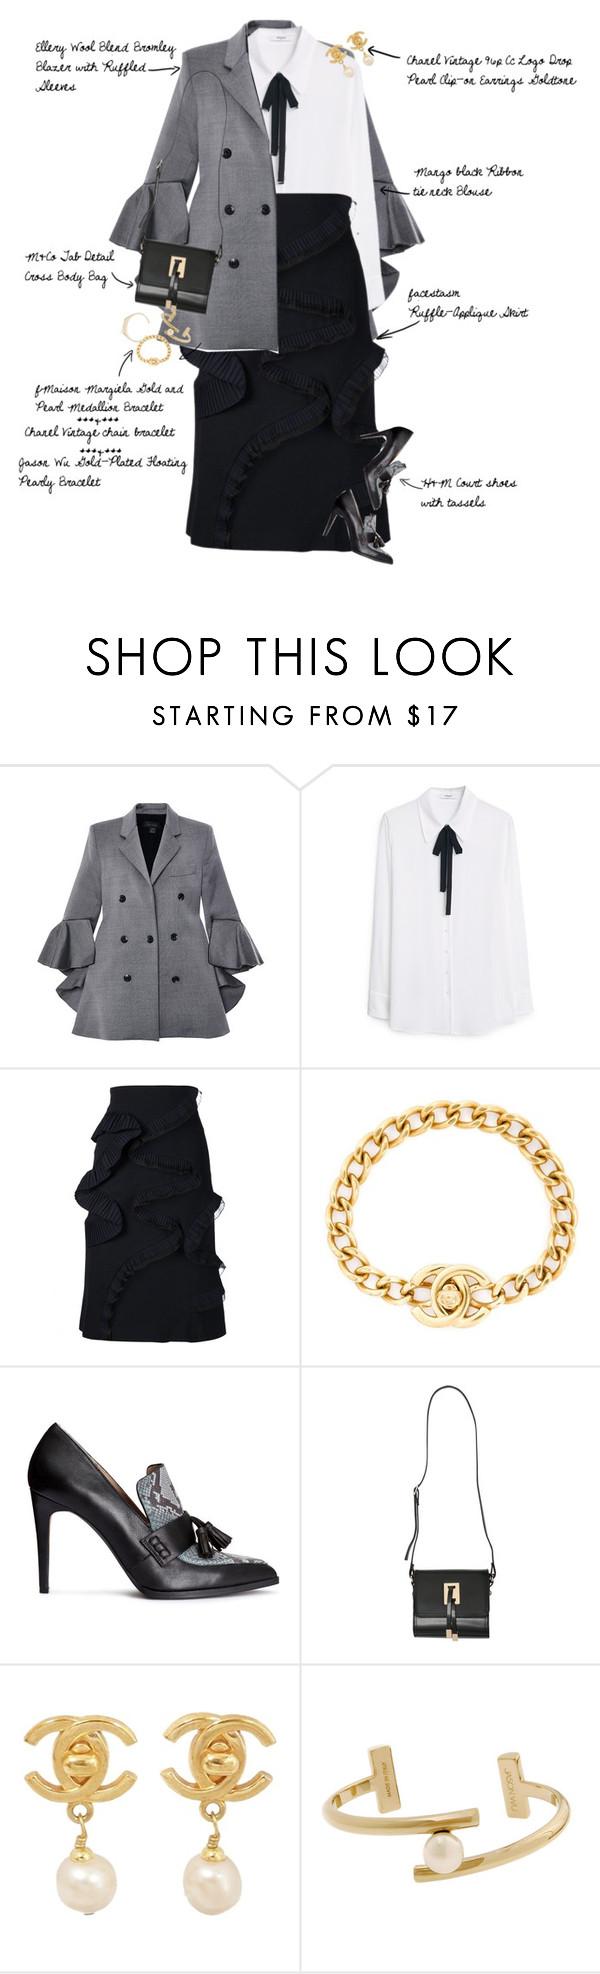 """High Fashion Take on Workwear"" by fashionscribbles ❤ liked on Polyvore featuring E L L E R Y, MANGO, Facetasm, Chanel, H&M, M&Co, Jason Wu, Maison Margiela, WorkWear and highfashion"